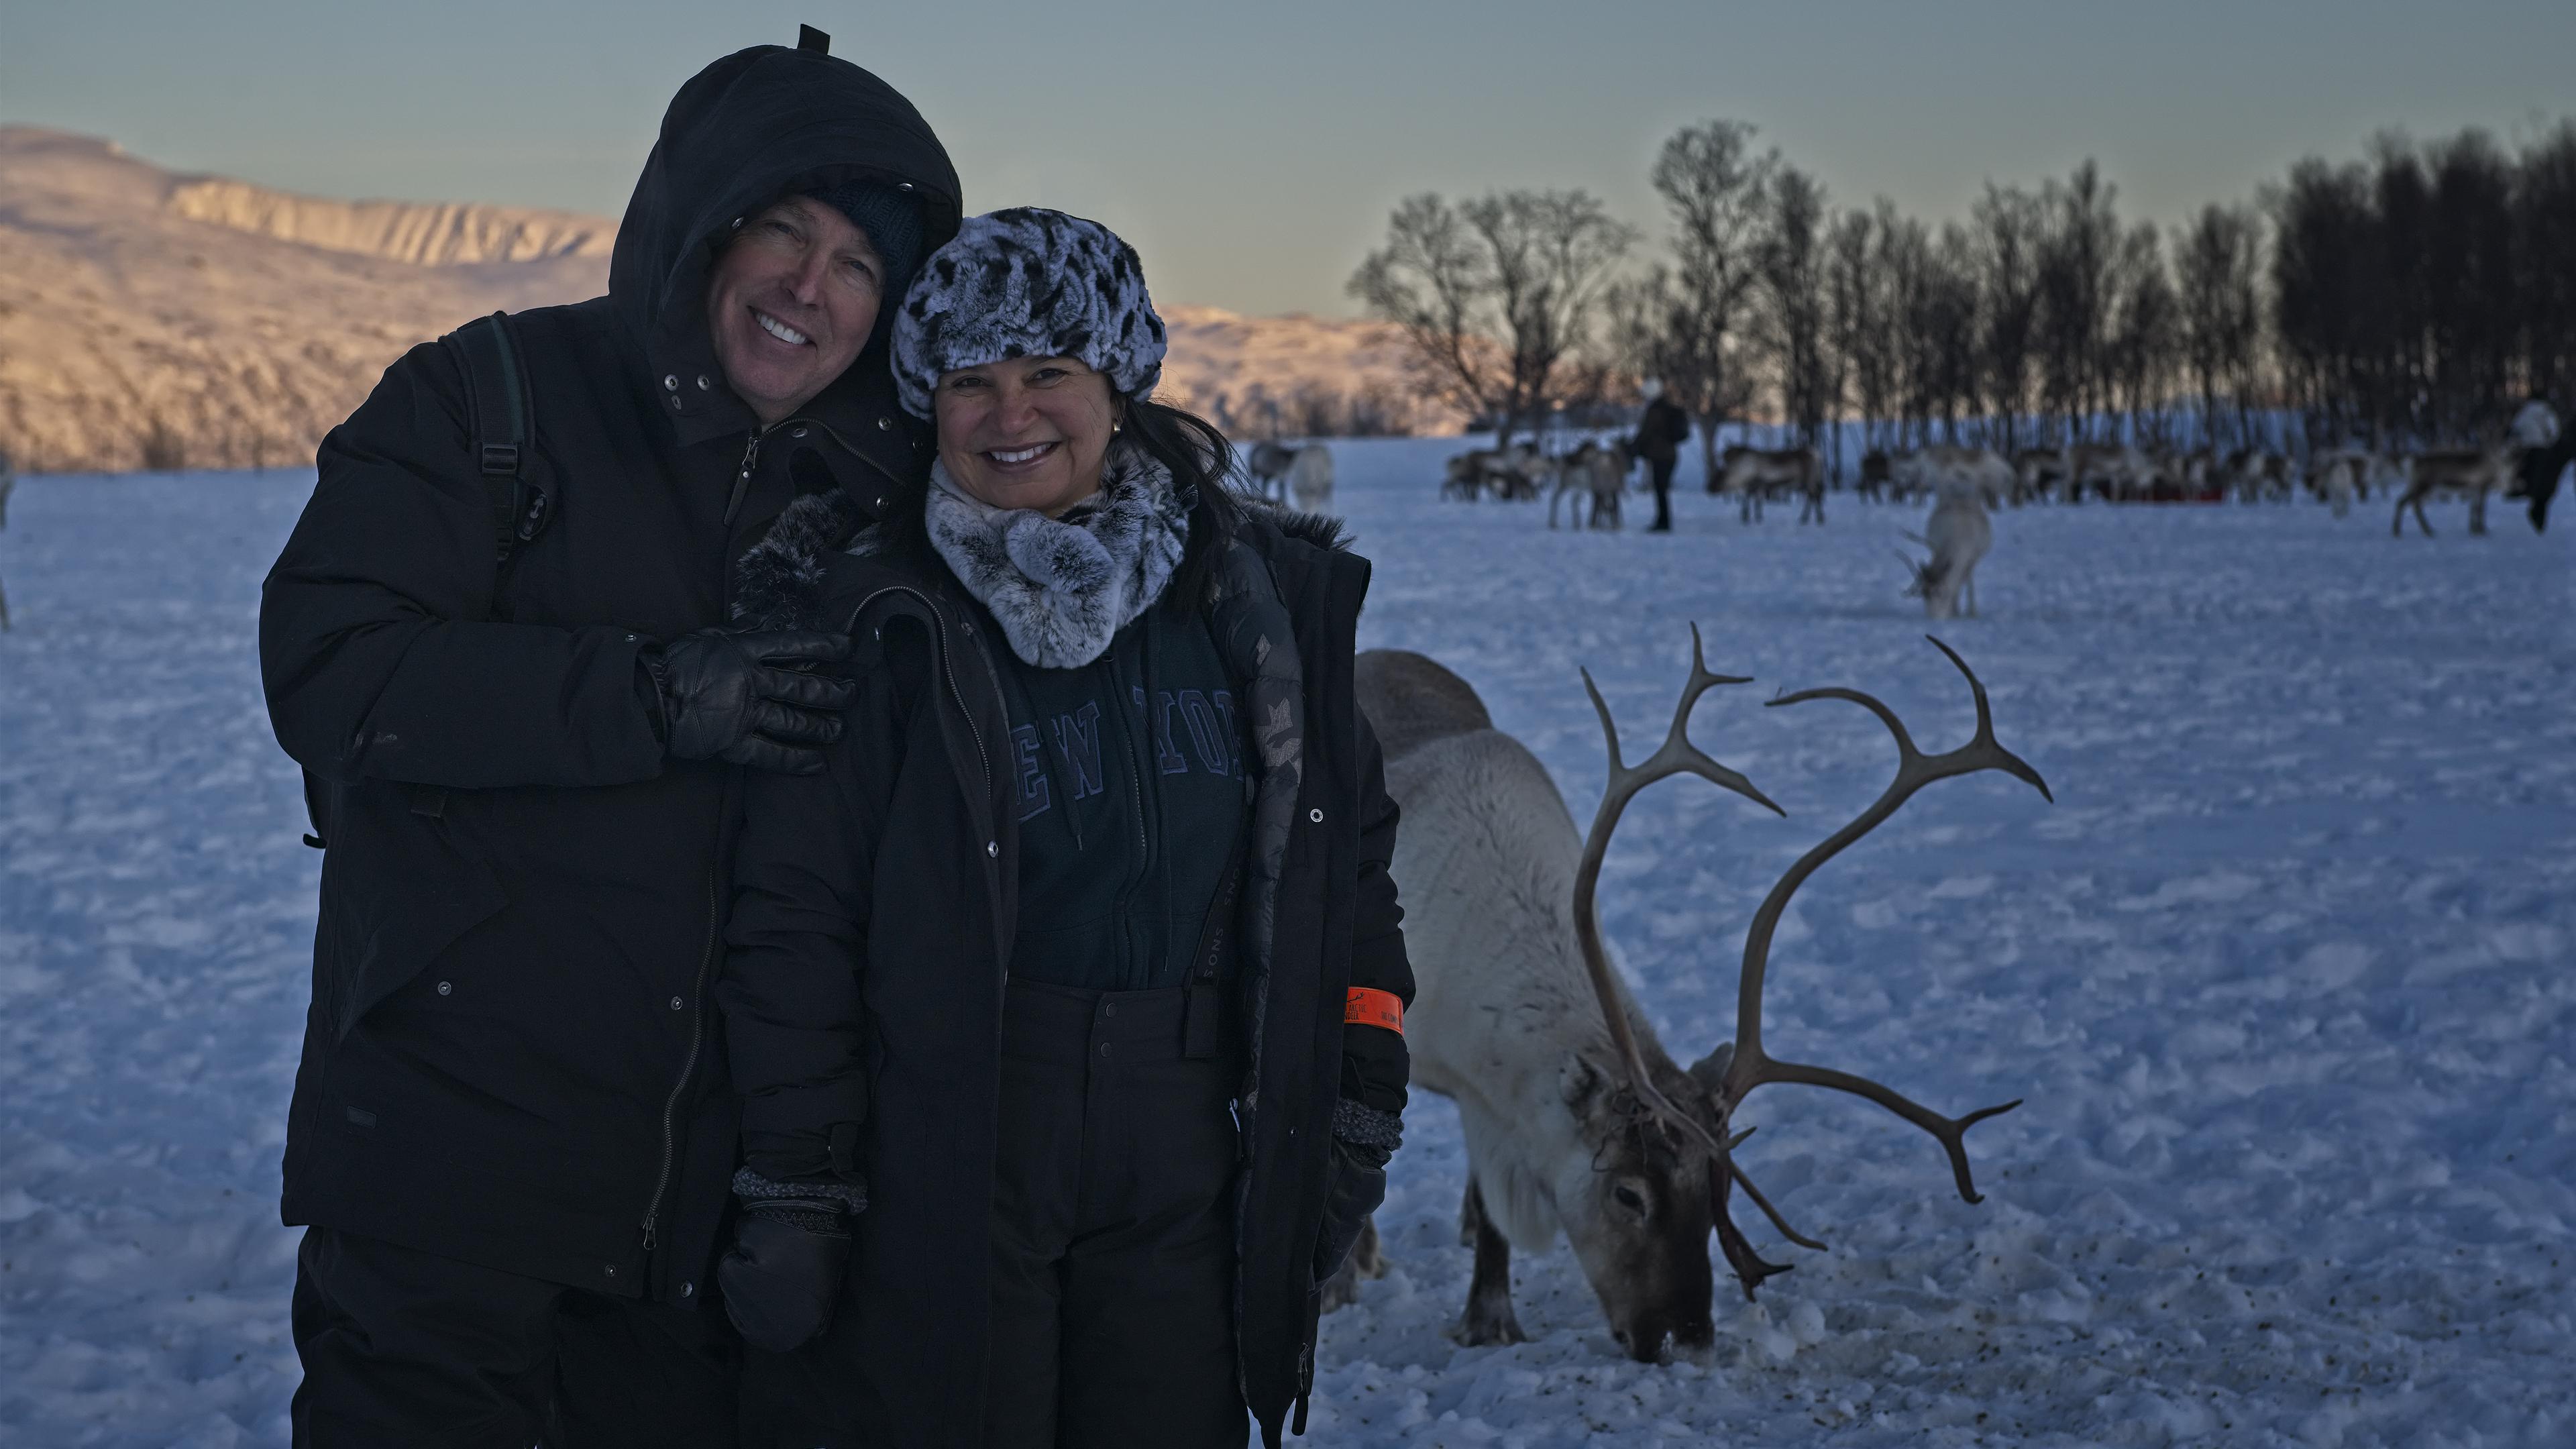 Dirce wrangled her first Reindeer